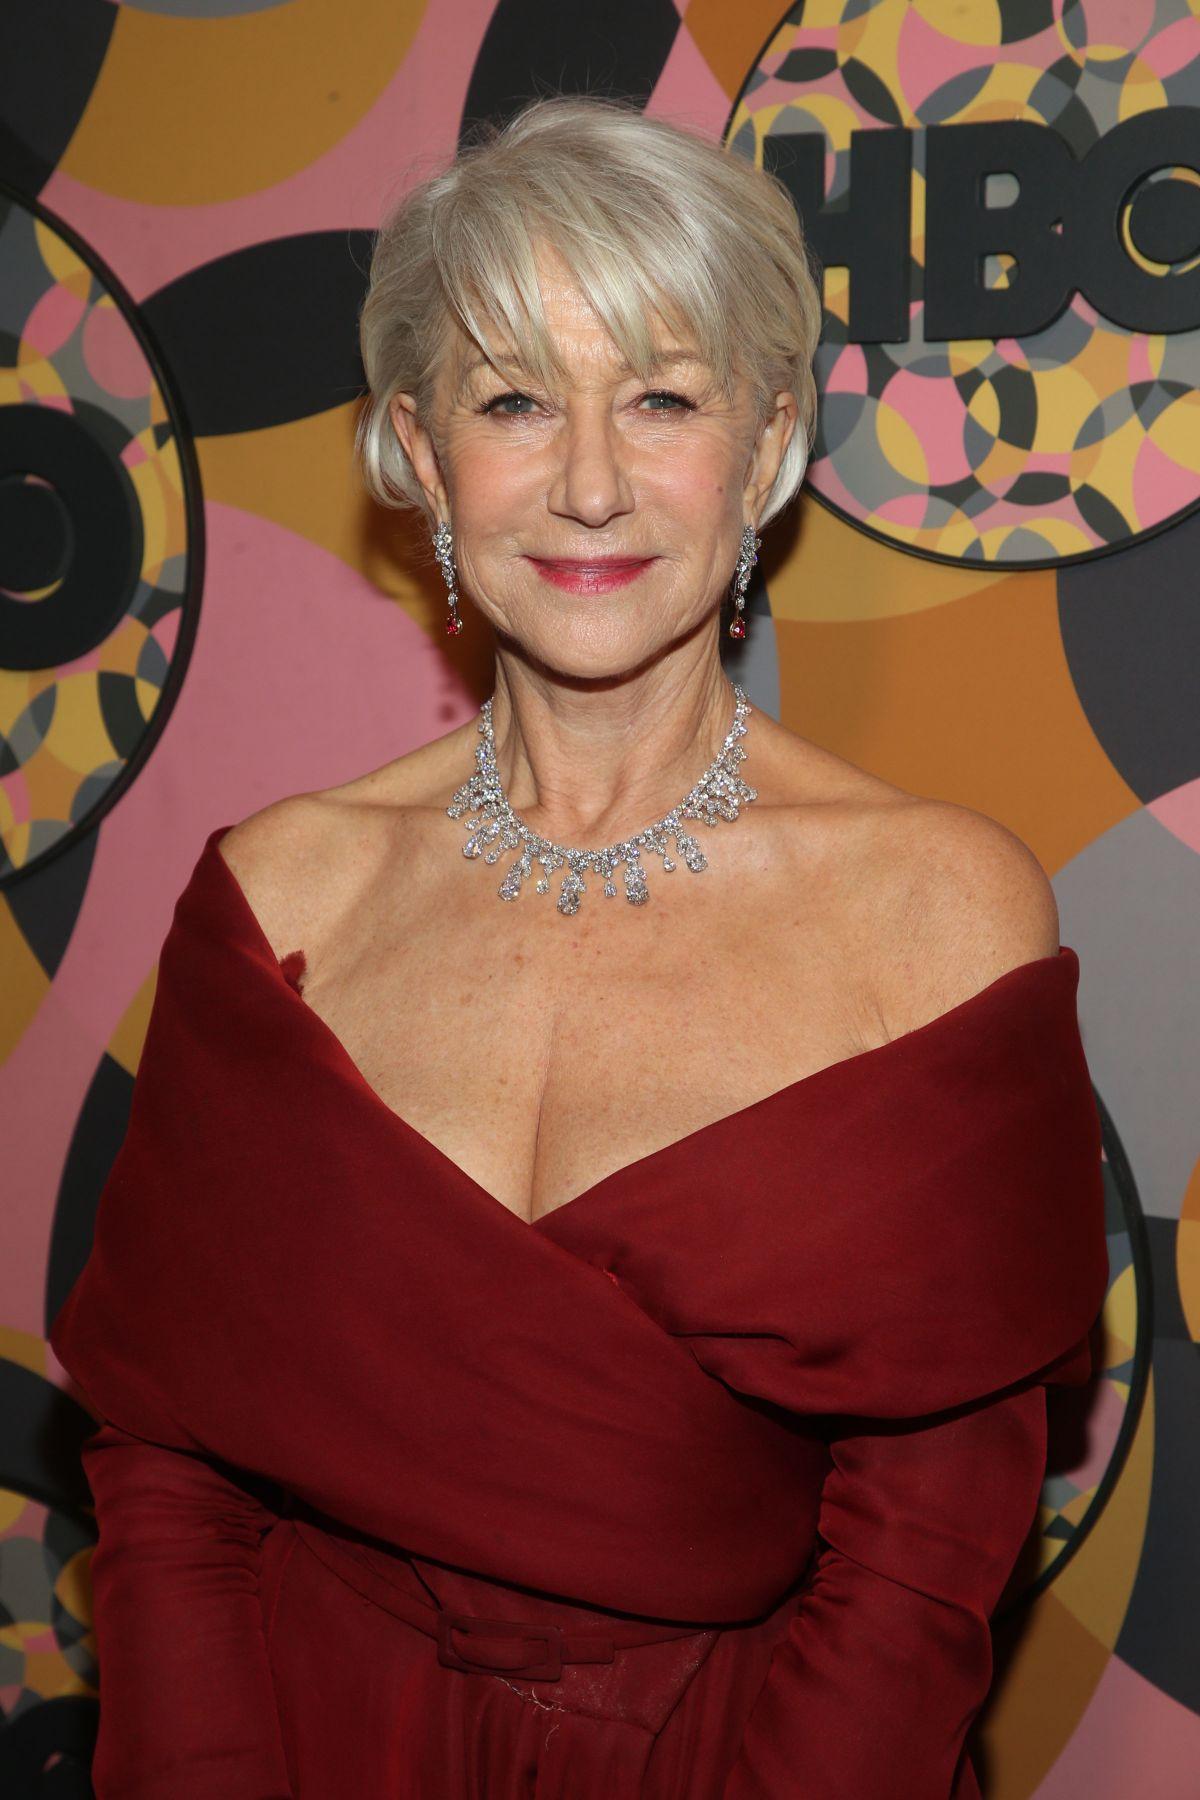 HELEN MIRREN at HBO Golden Globes Awards After-party 01/05